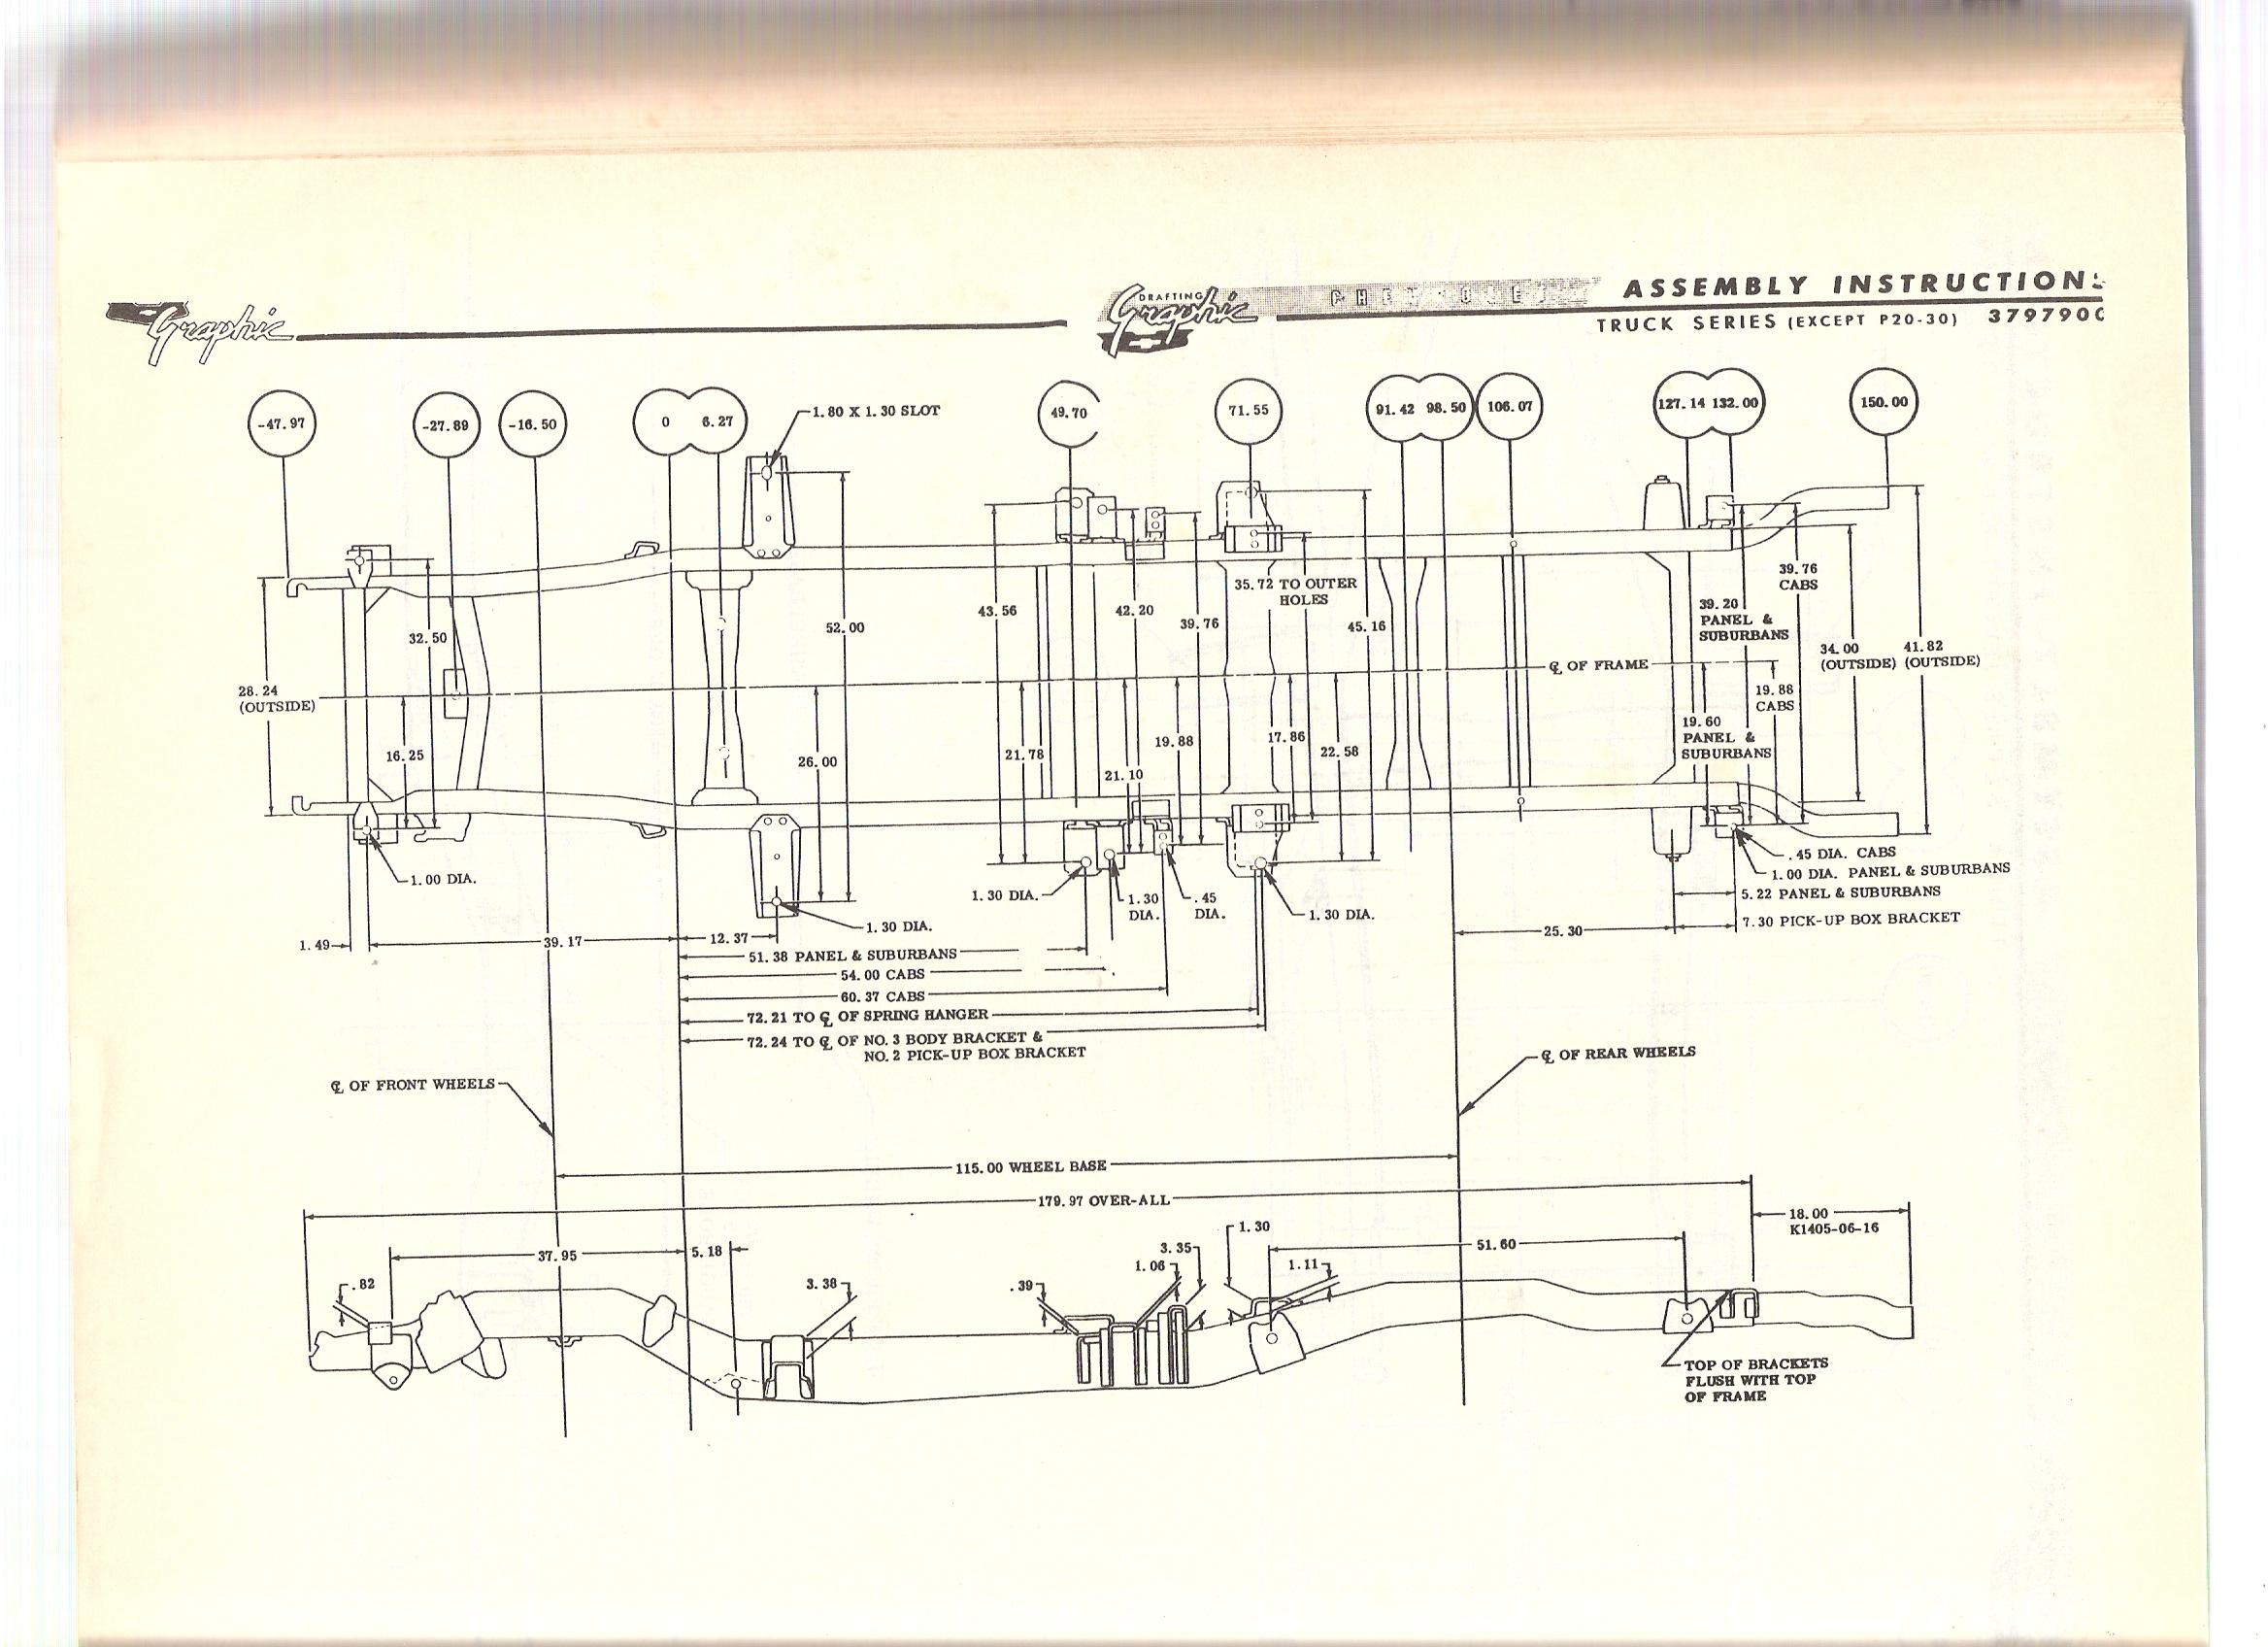 1963 1966 GMC Chevy Frame Schematic1?resize\\\\\=665%2C483 1978 gmc truck electrical wiring diagrams gandul 45 77 79 119 gmc truck electrical wiring diagrams at virtualis.co